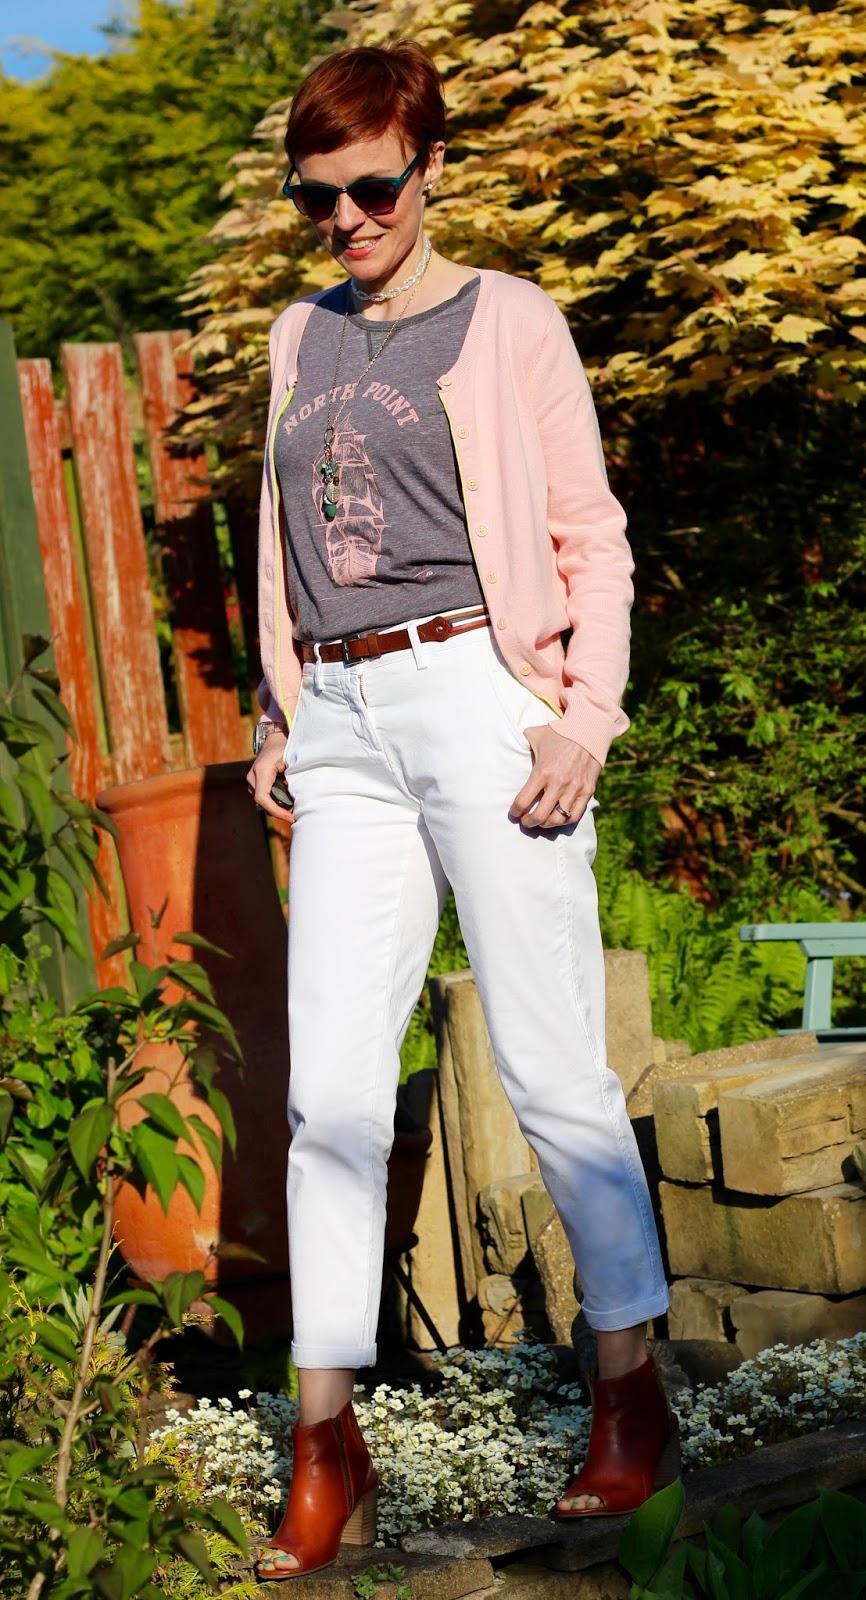 Fake Fabulous | Slogan T-shirt, White jeans, Tan peep-toe booties and green toes.